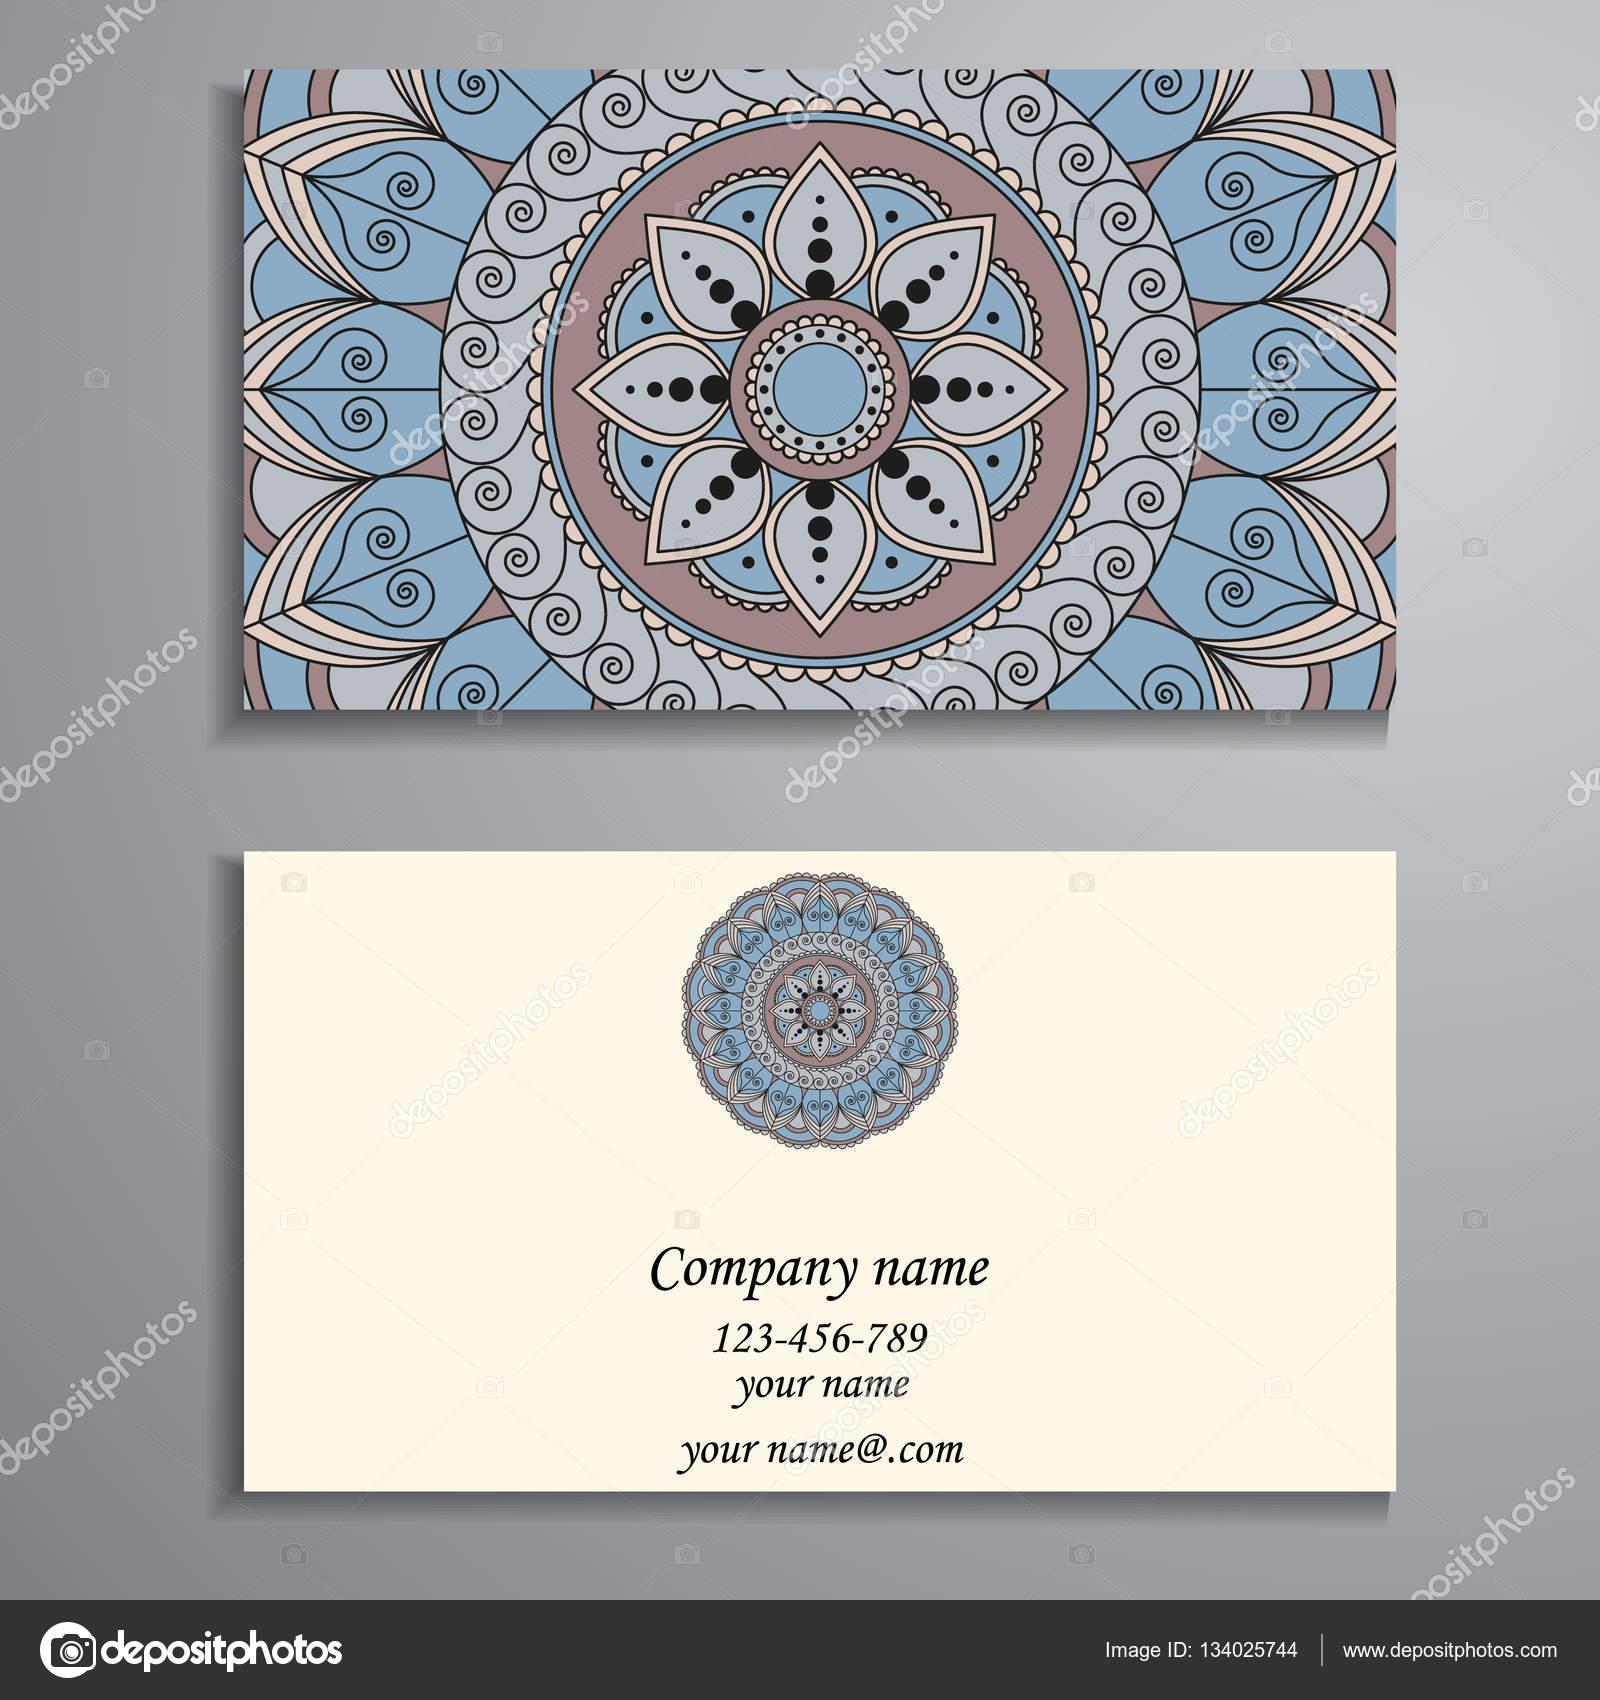 Business card vintage decorative elements ornamental floral bu business card vintage decorative elements ornamental floral bu stock vector reheart Choice Image